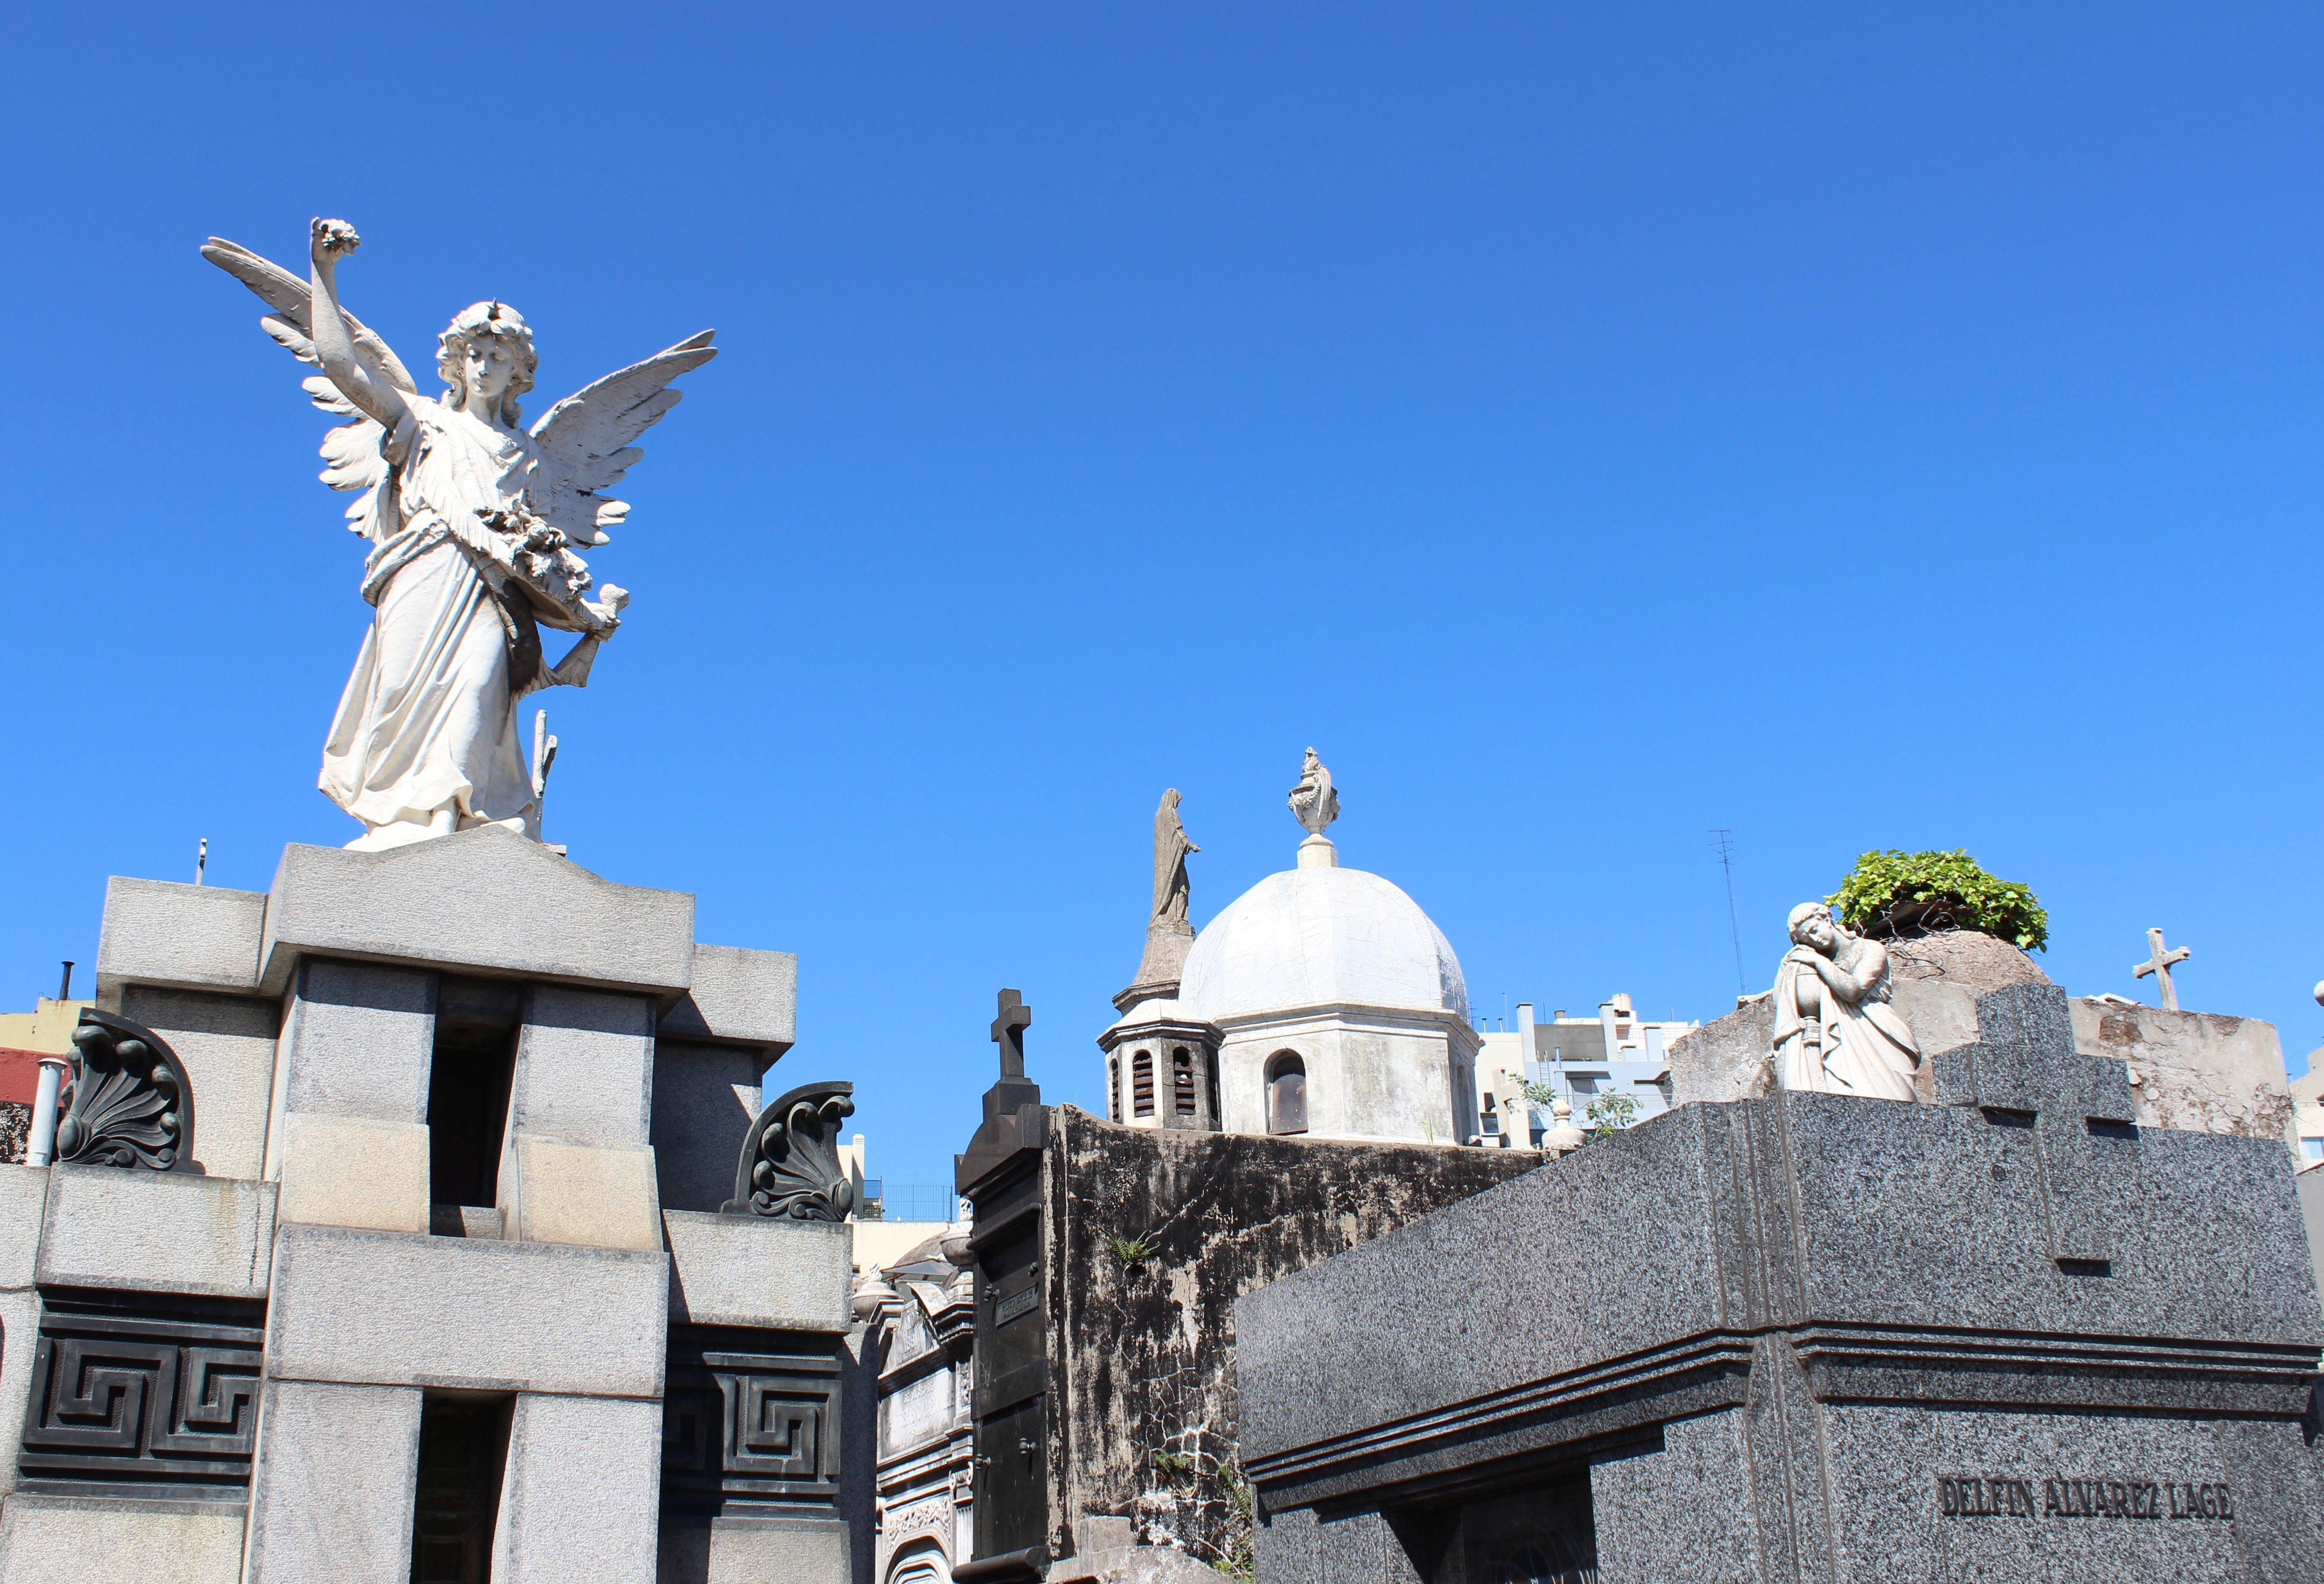 Argentína, Buenos Aires-Recoleta temető - Fotó: Papp Éva